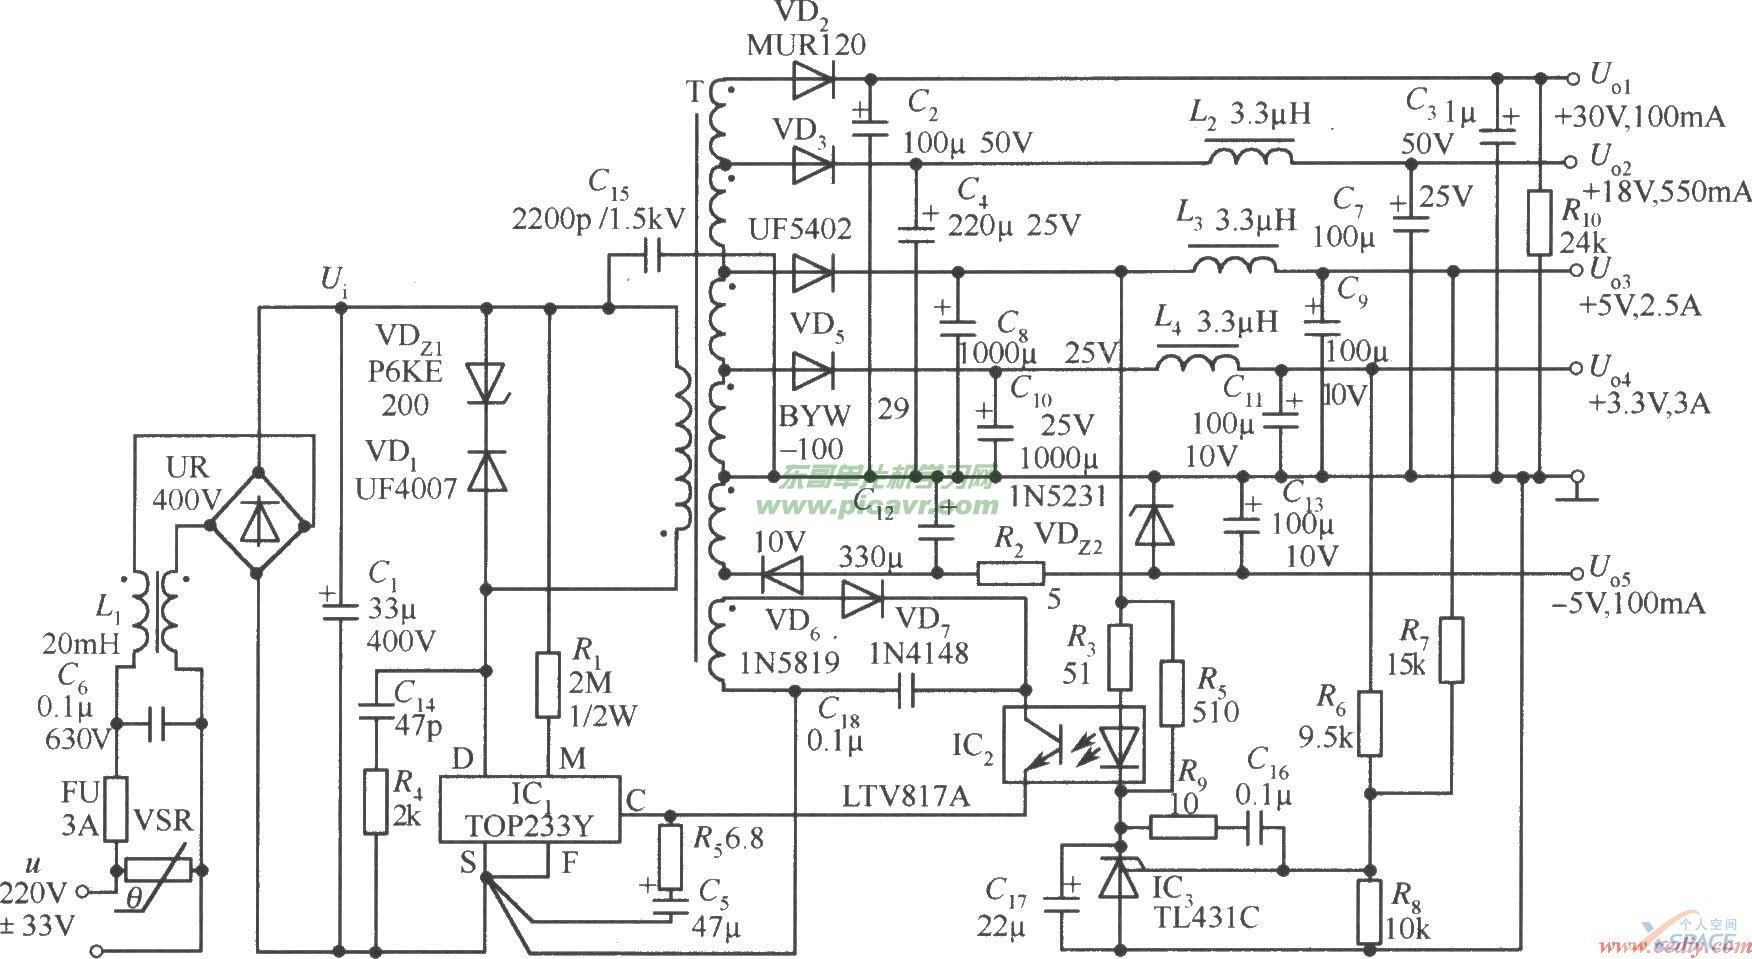 电路图这5路电压分别为:uo1(+30v,100ma),uo2(+18v,550ma),uo3(+5v